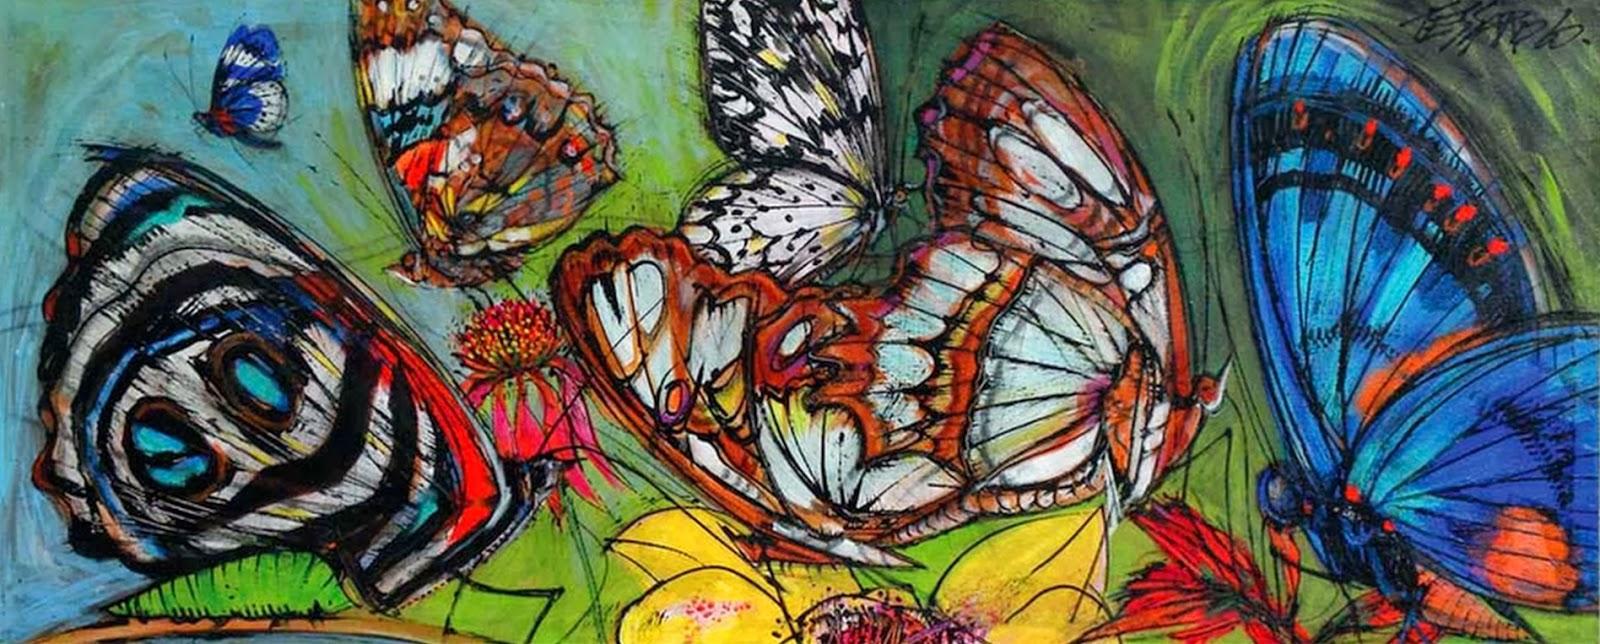 Cuadros modernos pinturas y dibujos pintados a mano - Murales de pared pintados a mano ...